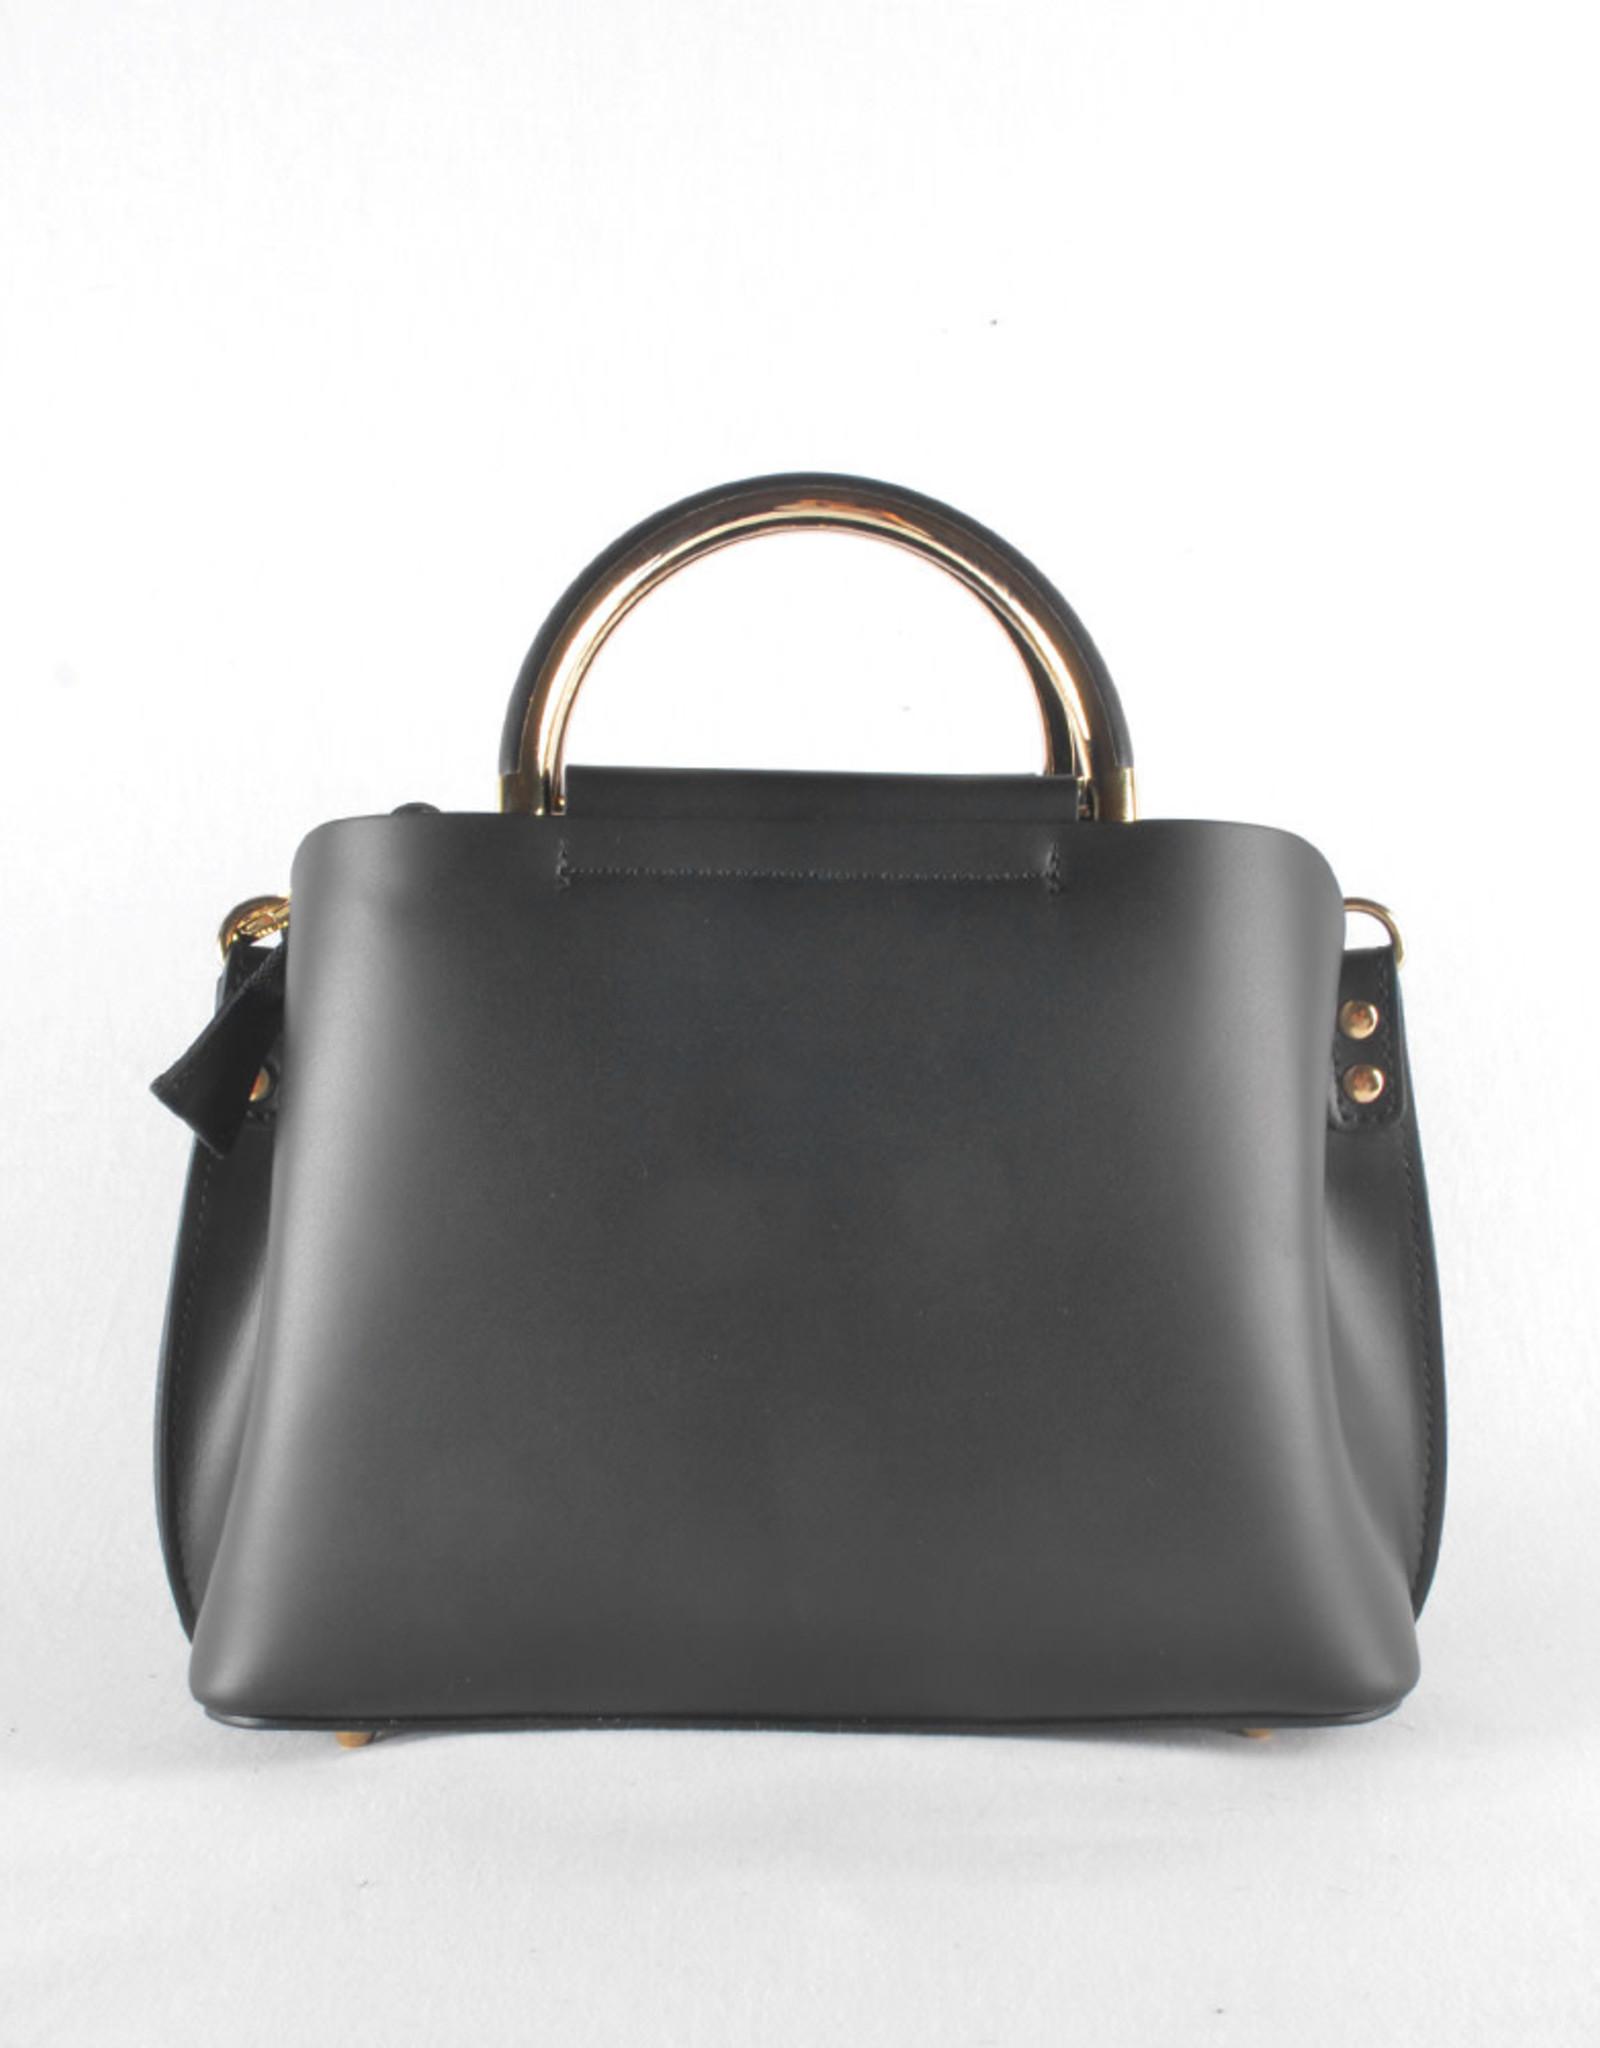 Square gold black bag